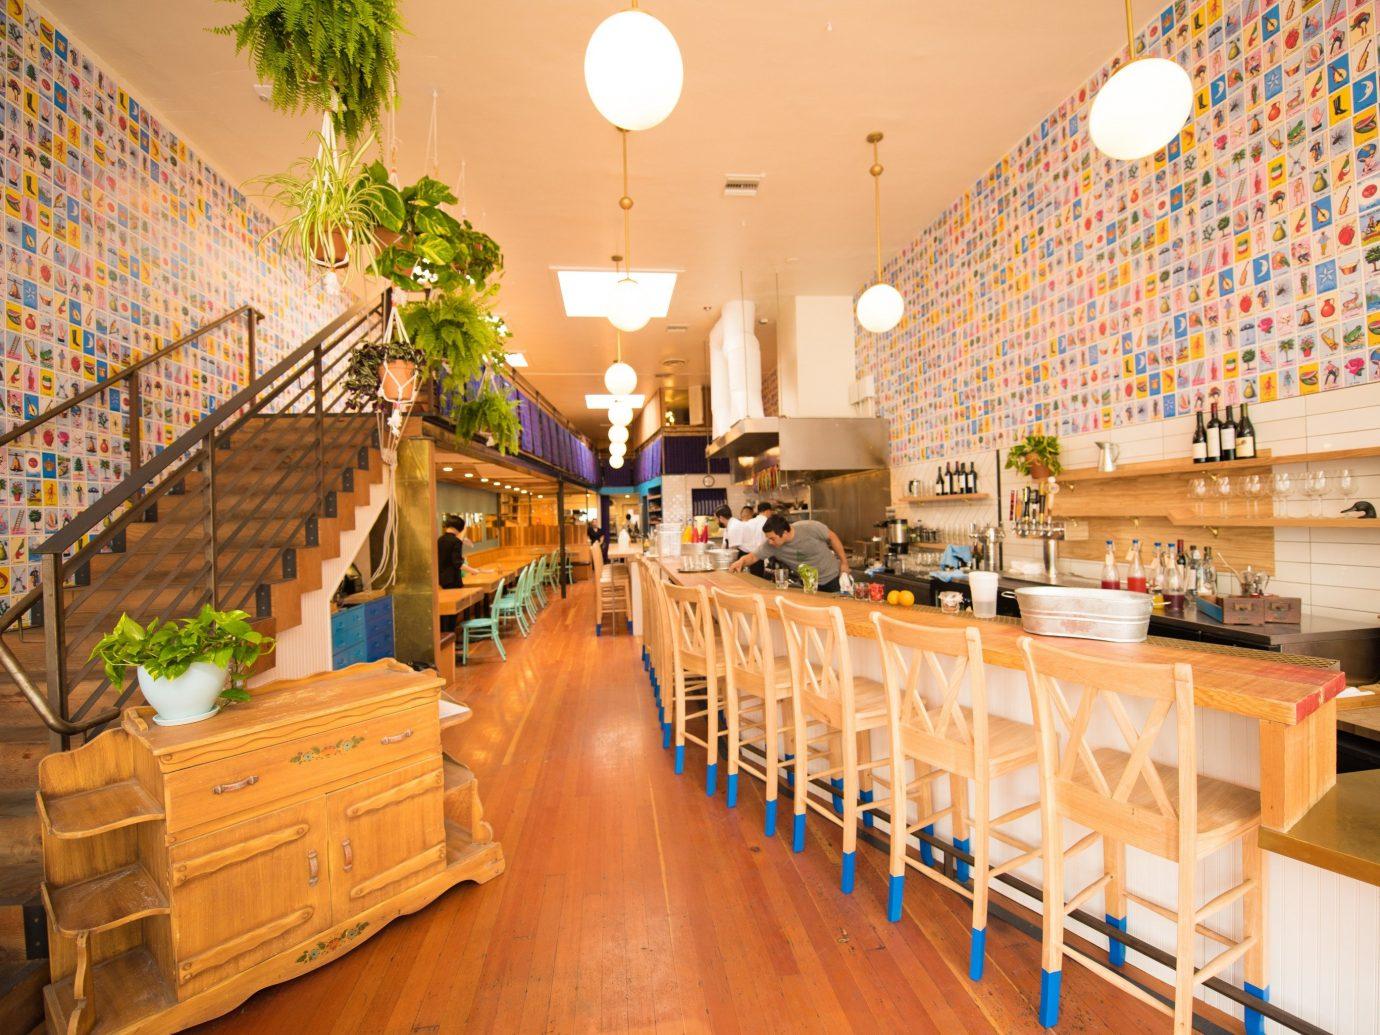 Summer Series floor indoor aisle restaurant meal interior design furniture wood